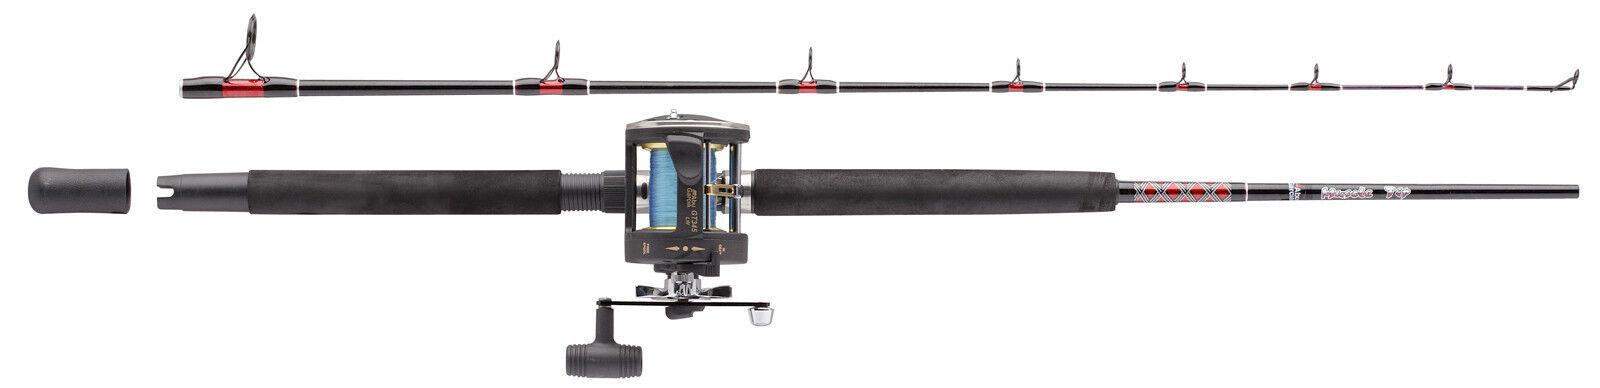 Abu GARCIA MUSCLE TIP BOAT Rod & Reel 6 & 7 piedi vetro solido Punta & multipler REEL